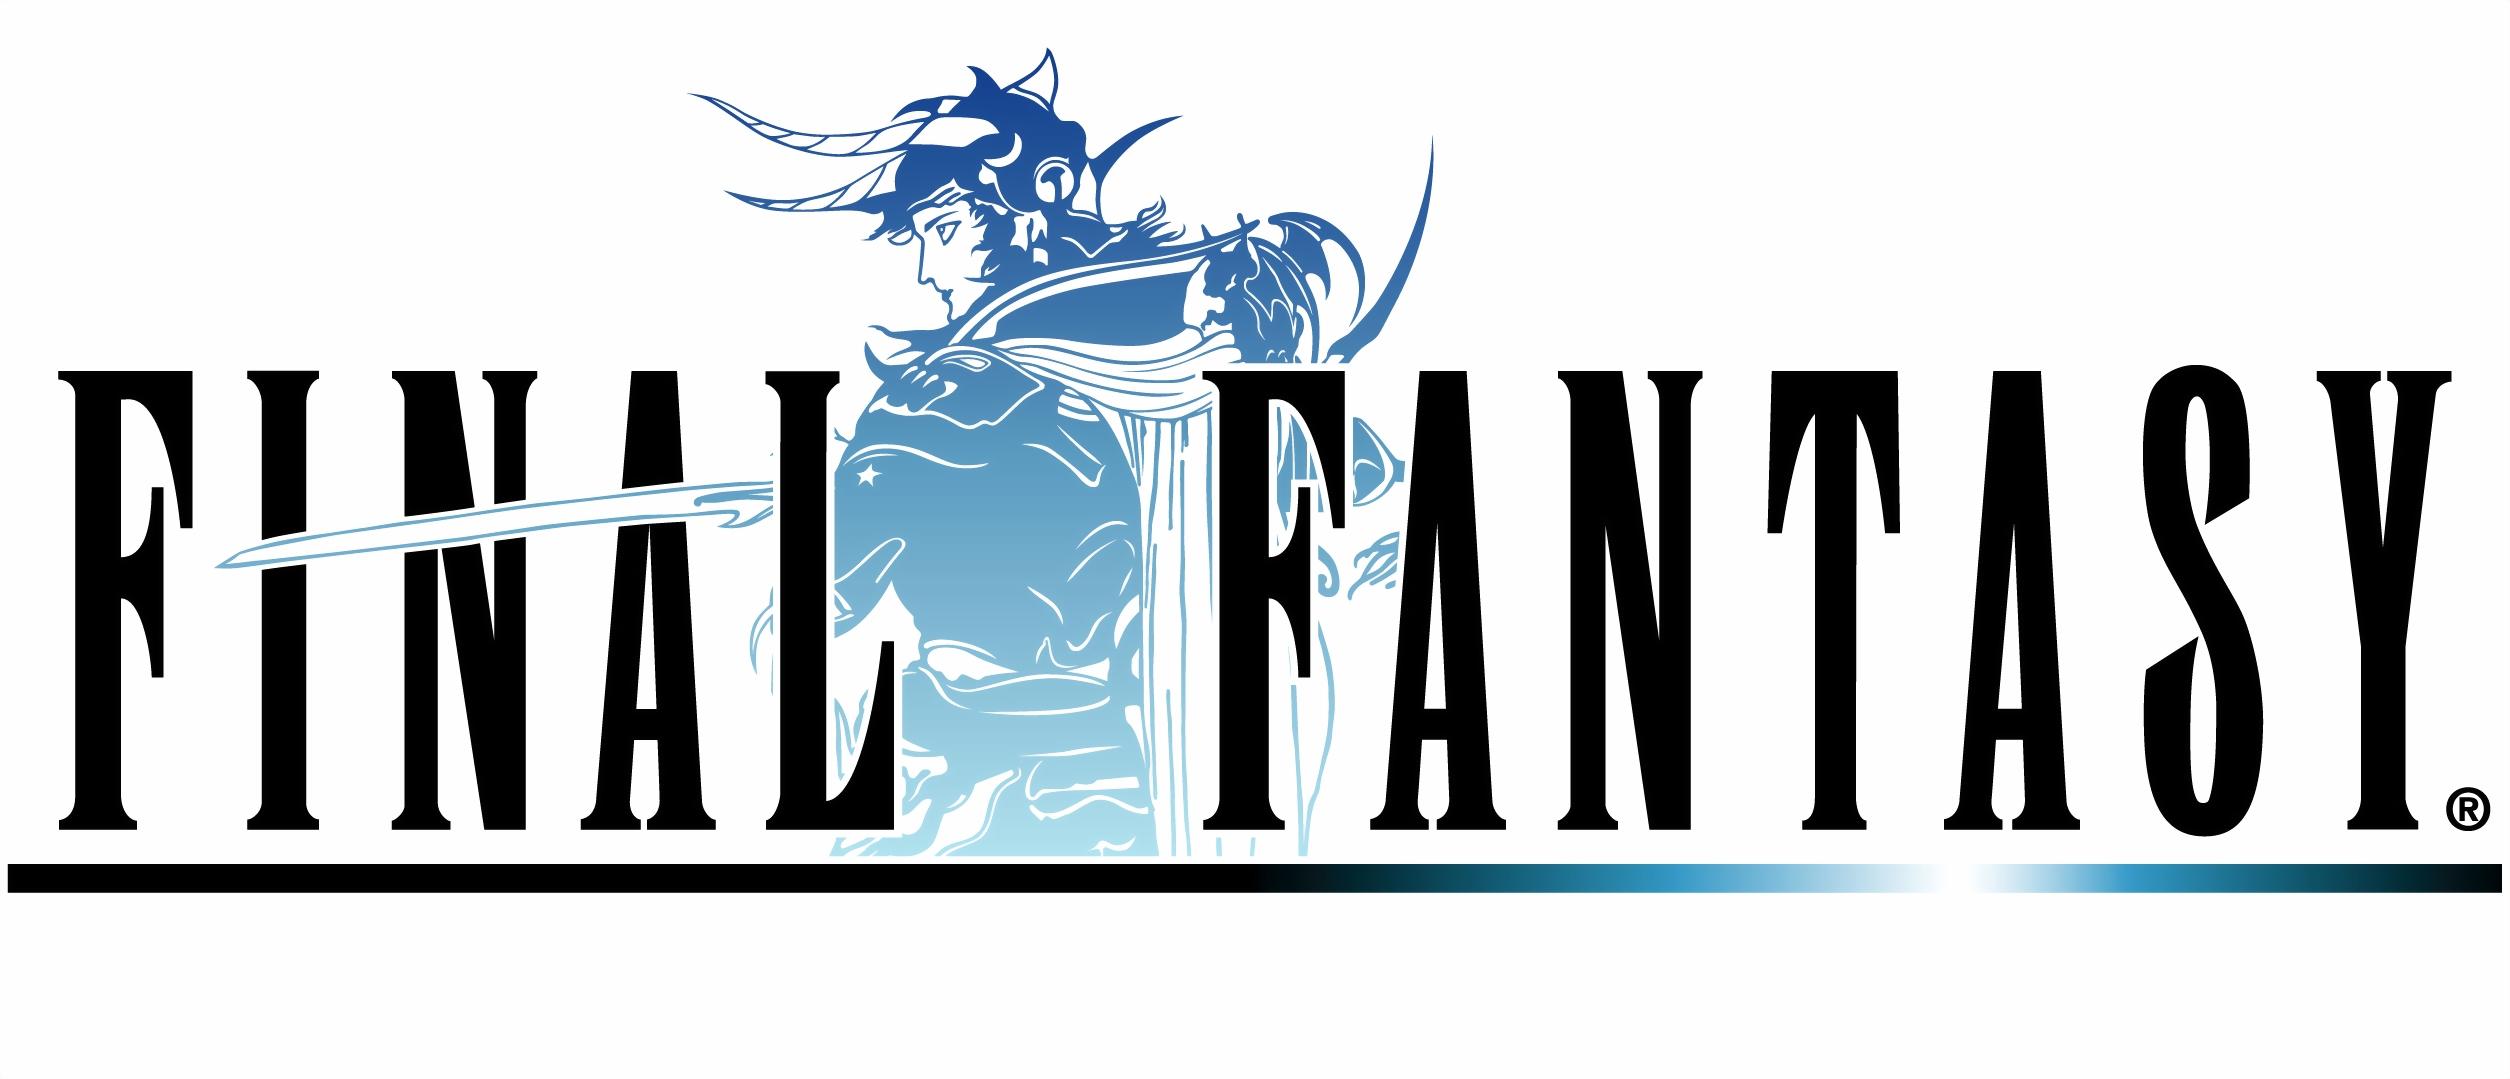 50. Final Fantasy